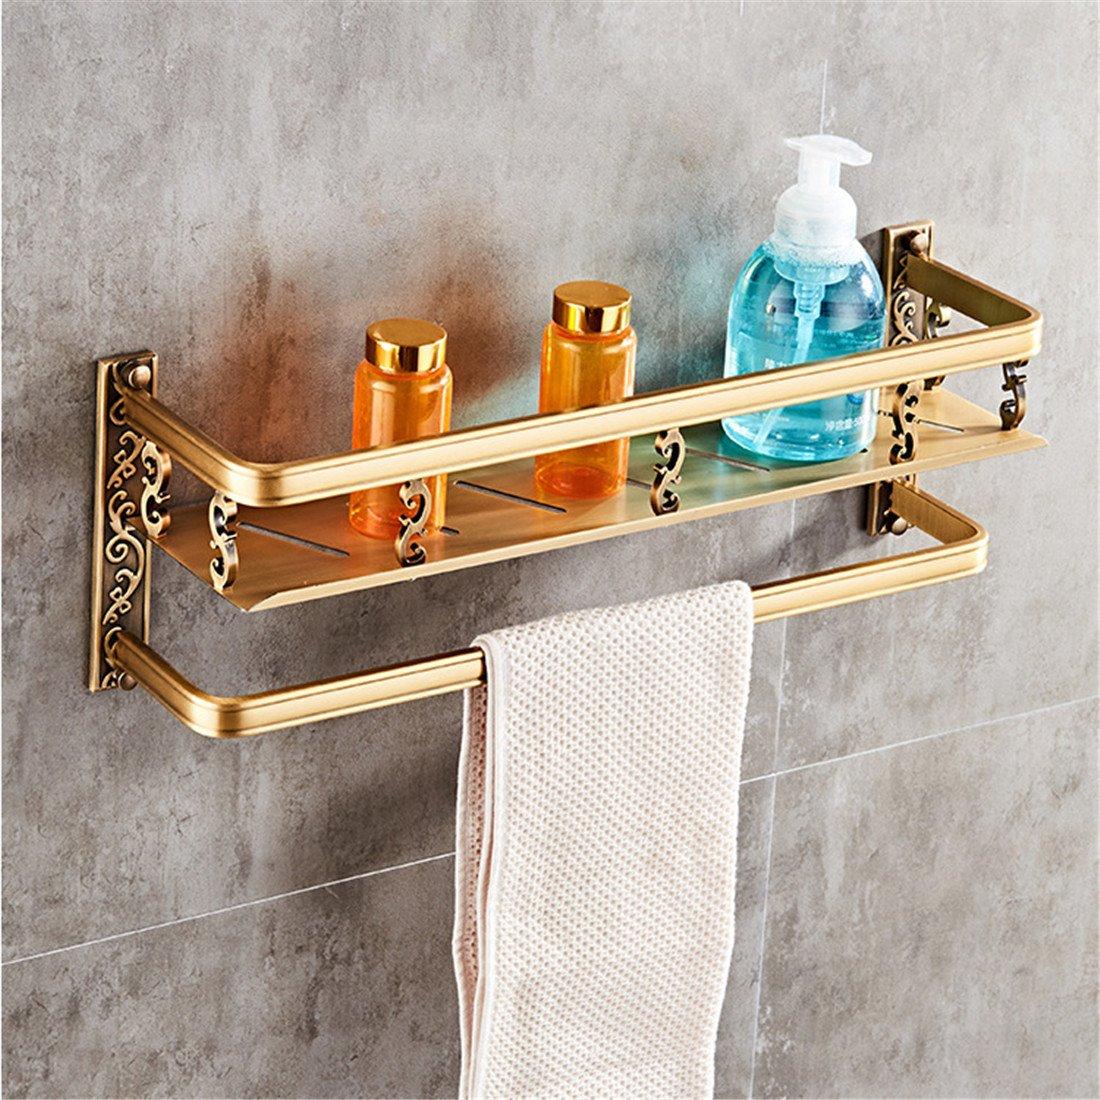 LAONA European style antique copper aluminum bathroom fittings, toilet paper frame, towel ring,Rack 1